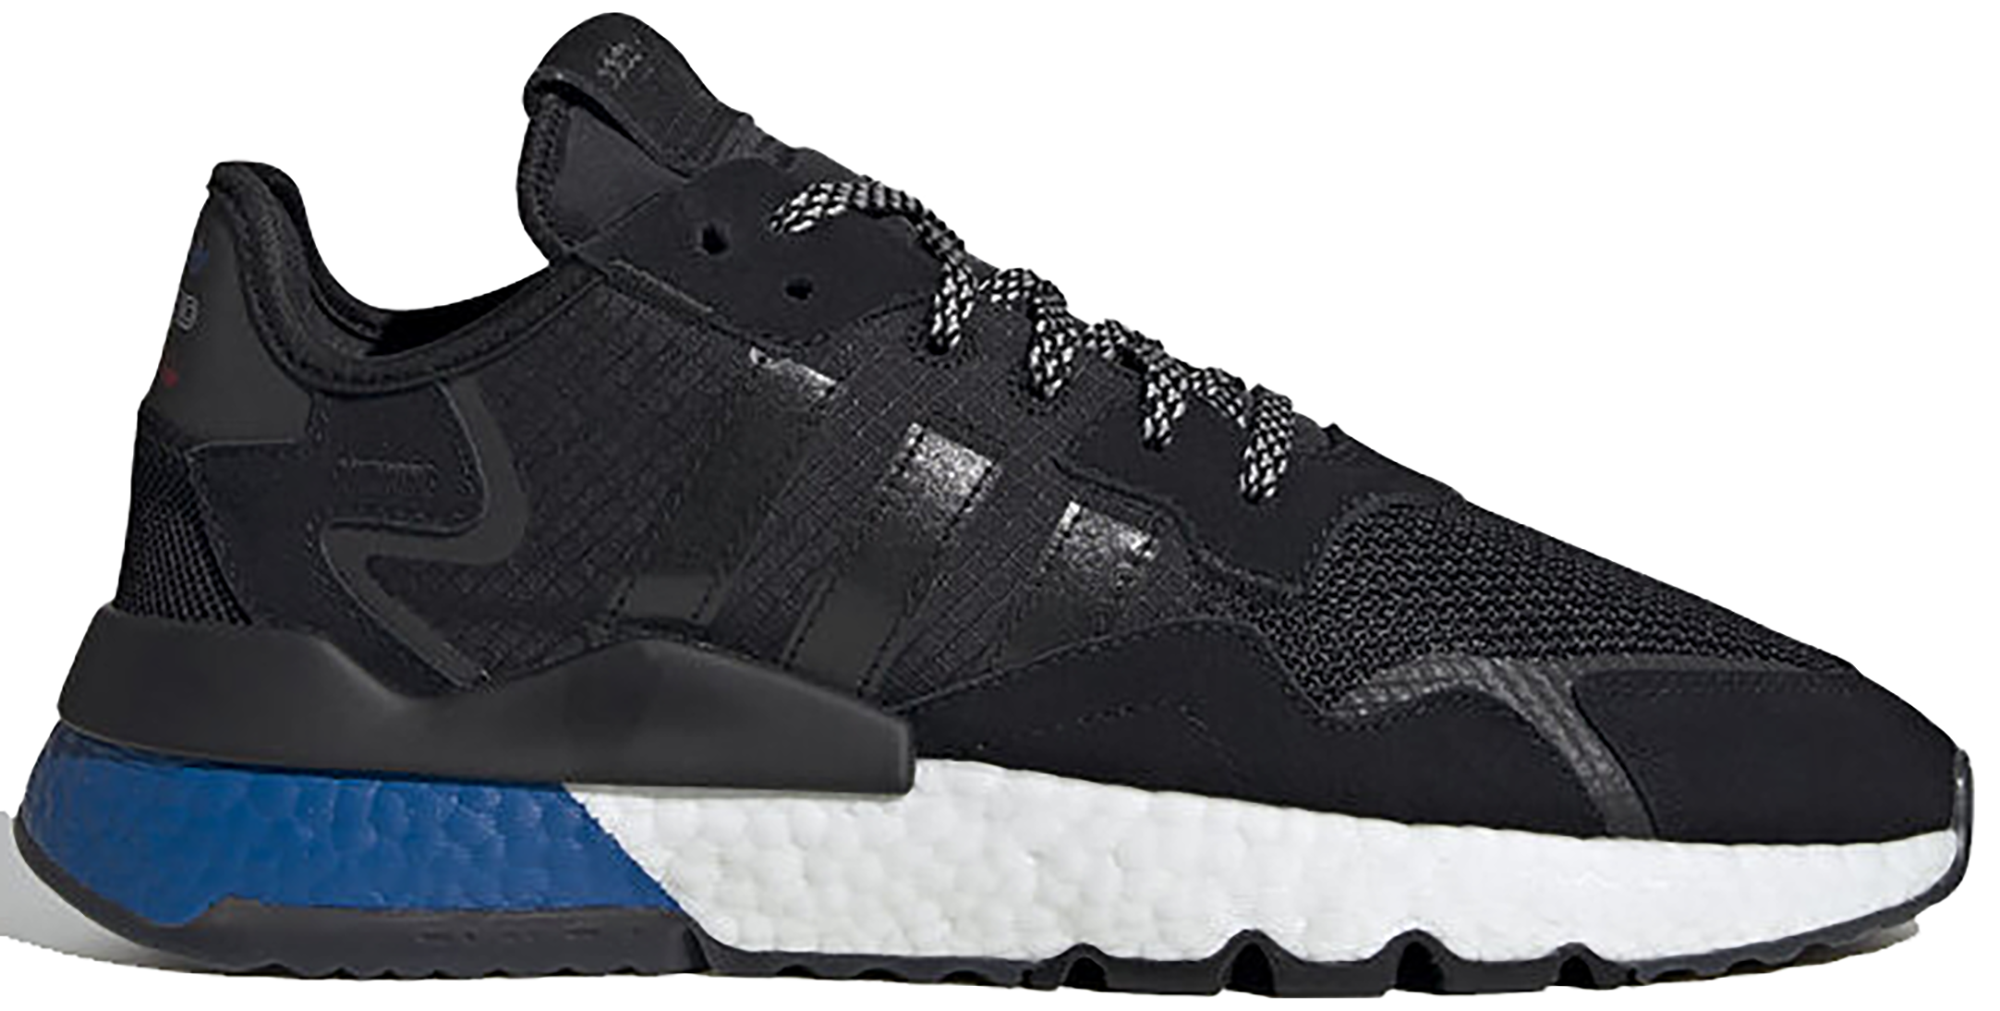 adidas Nite Jogger Core Black Lush Blue